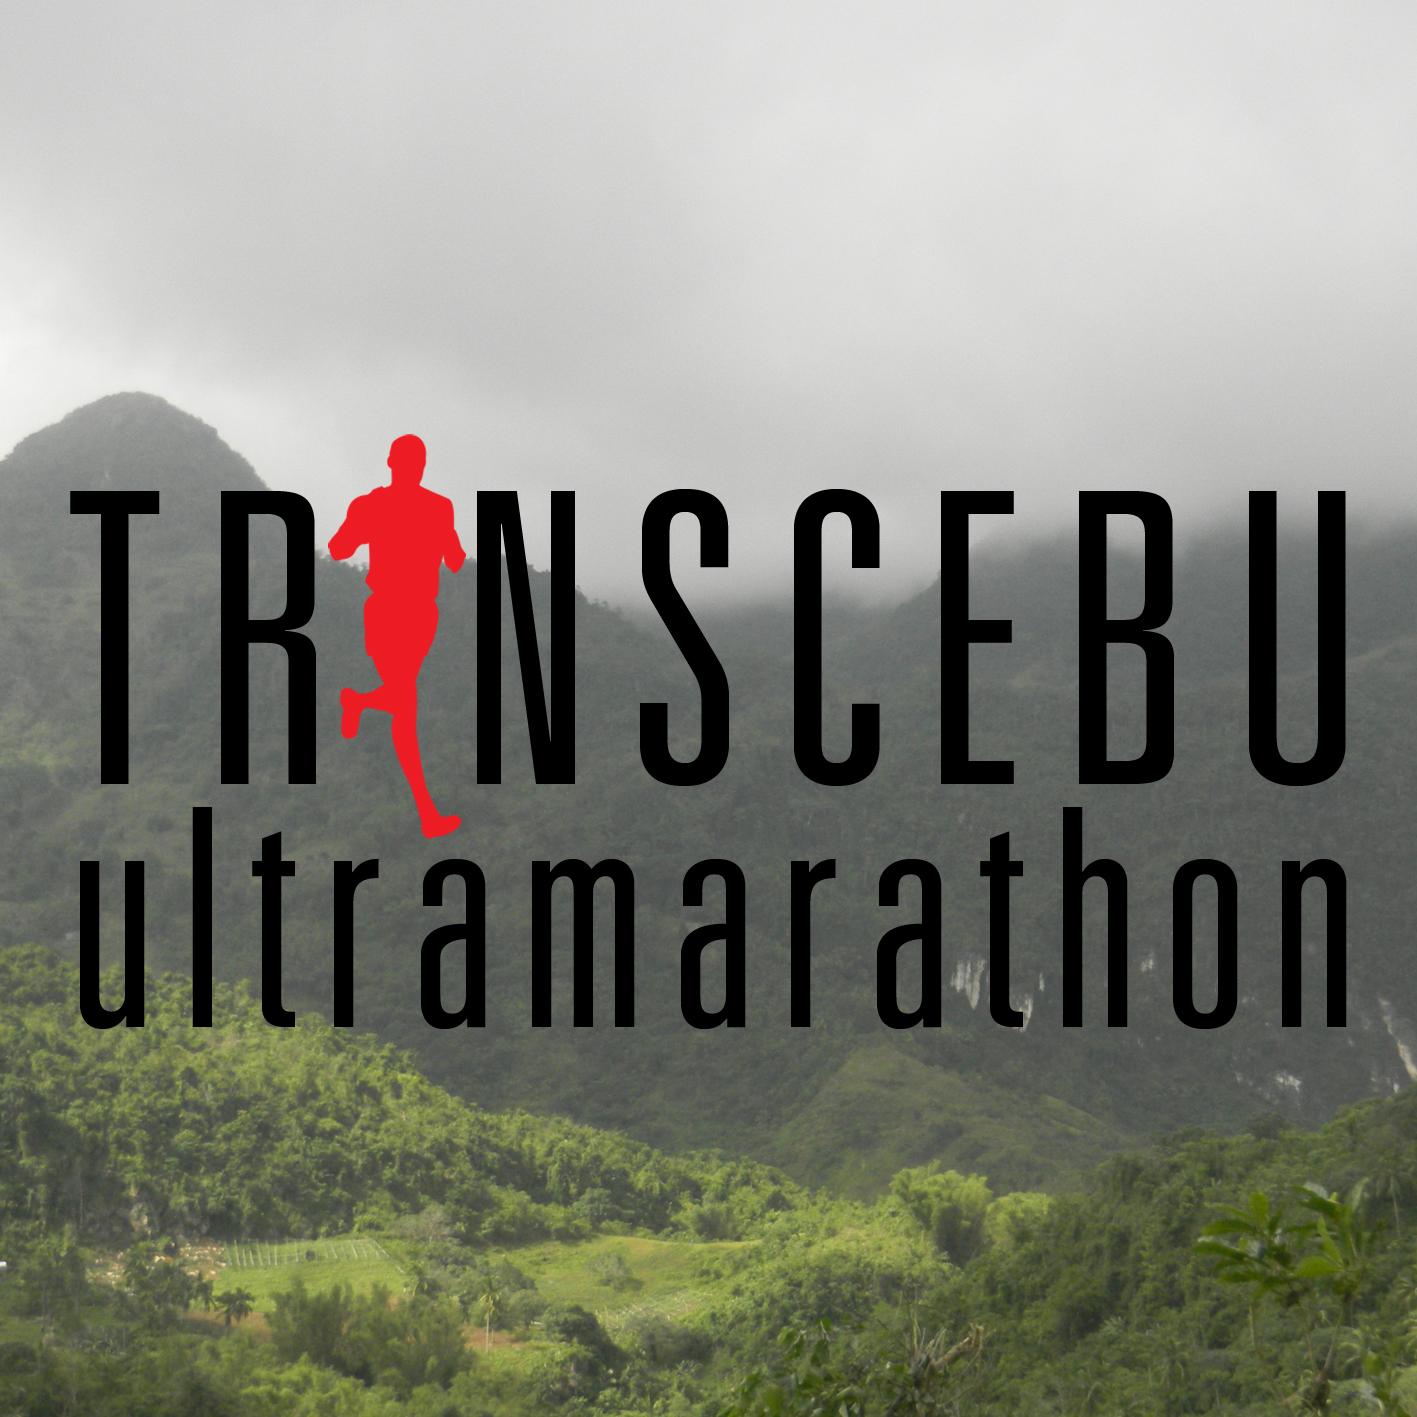 transcebu-ultramarathon-2014-poster